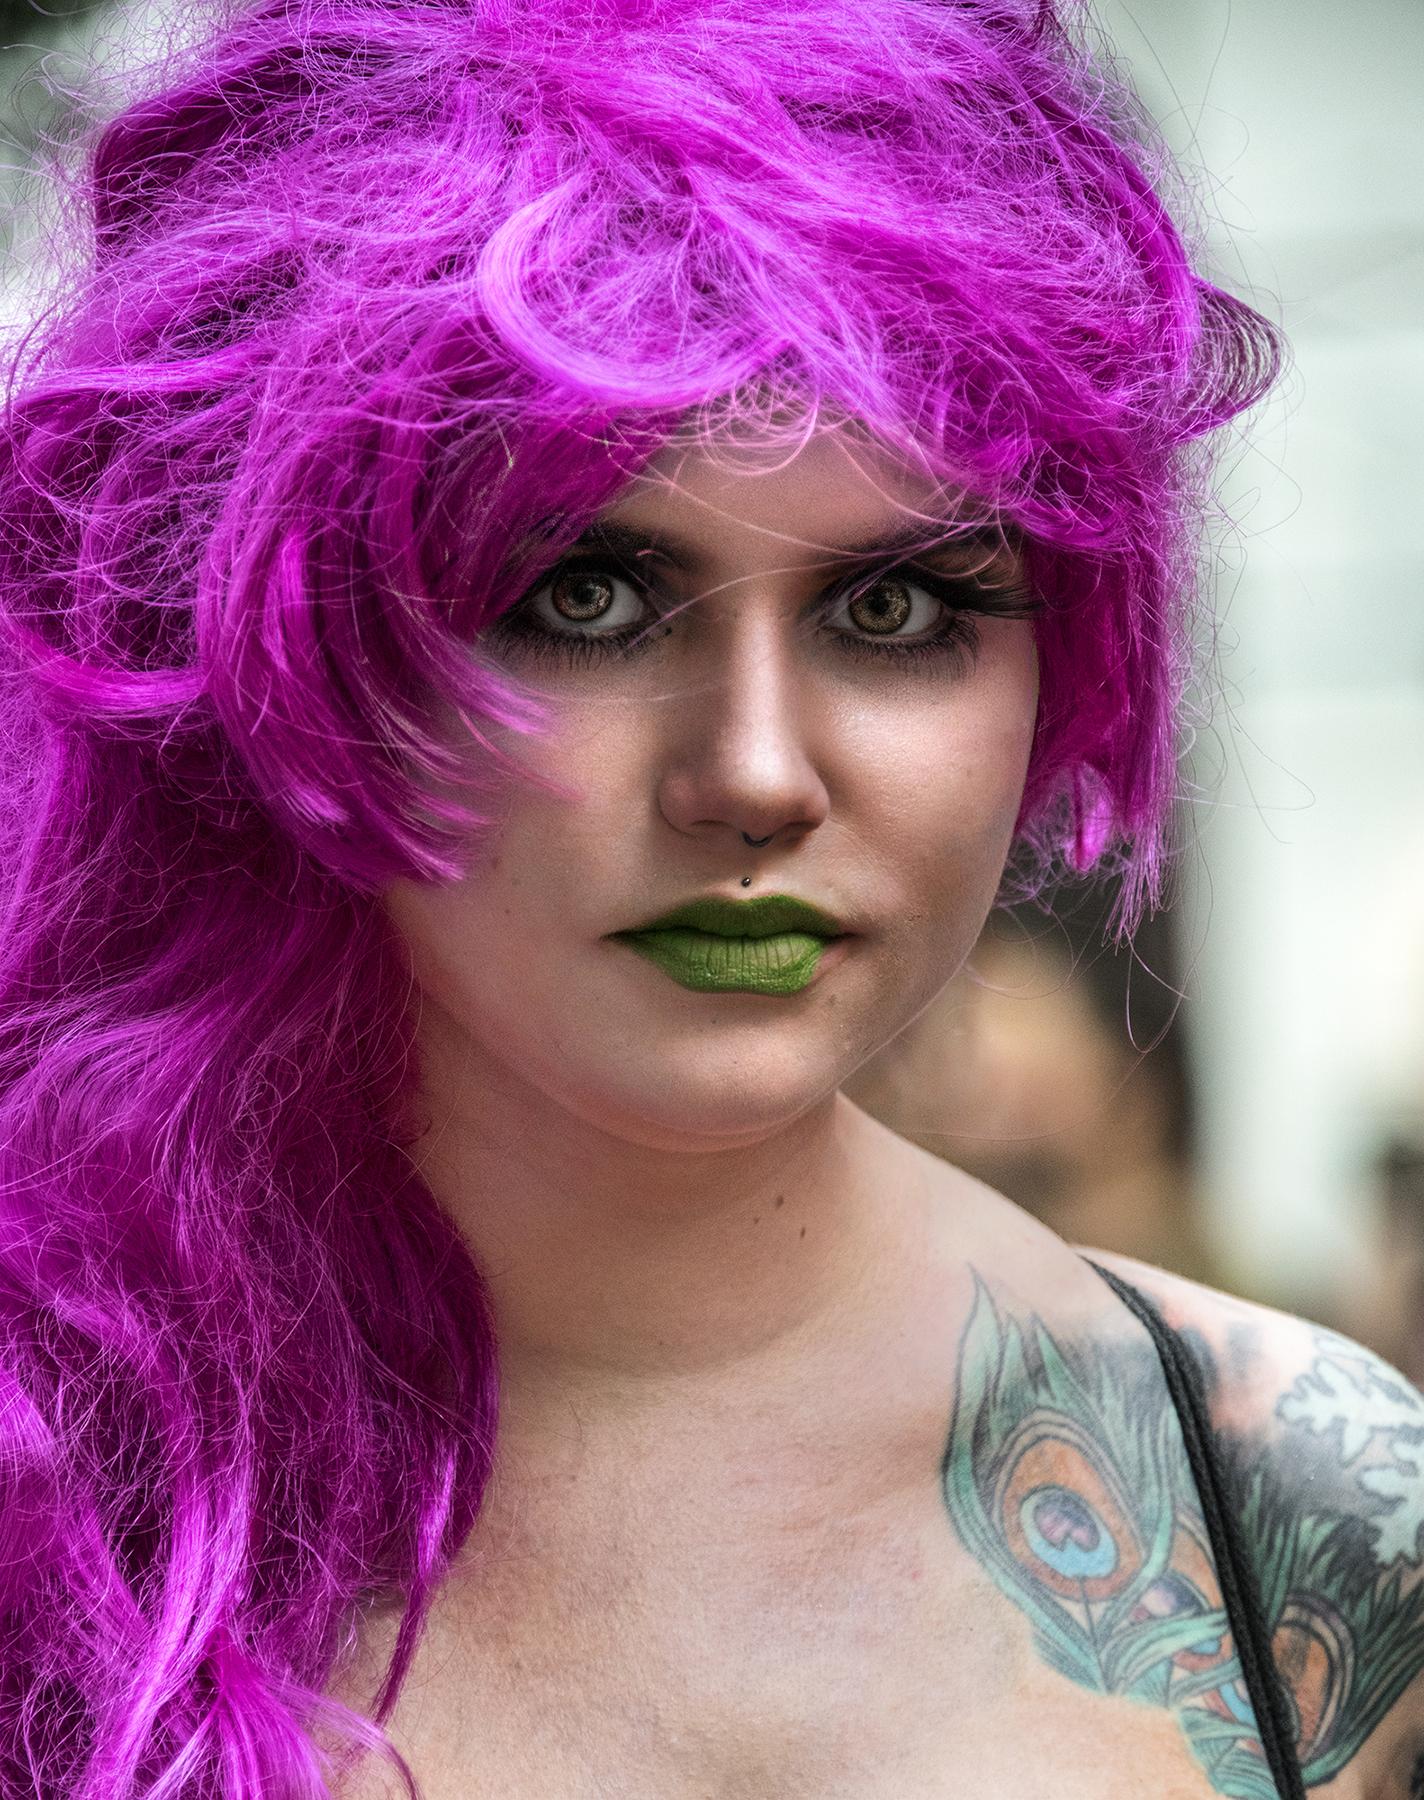 27_MICHAEL_WINTERS_VIENNA_PARADE_PARTICIPANT_LGBT_MARCHER_3.JPG